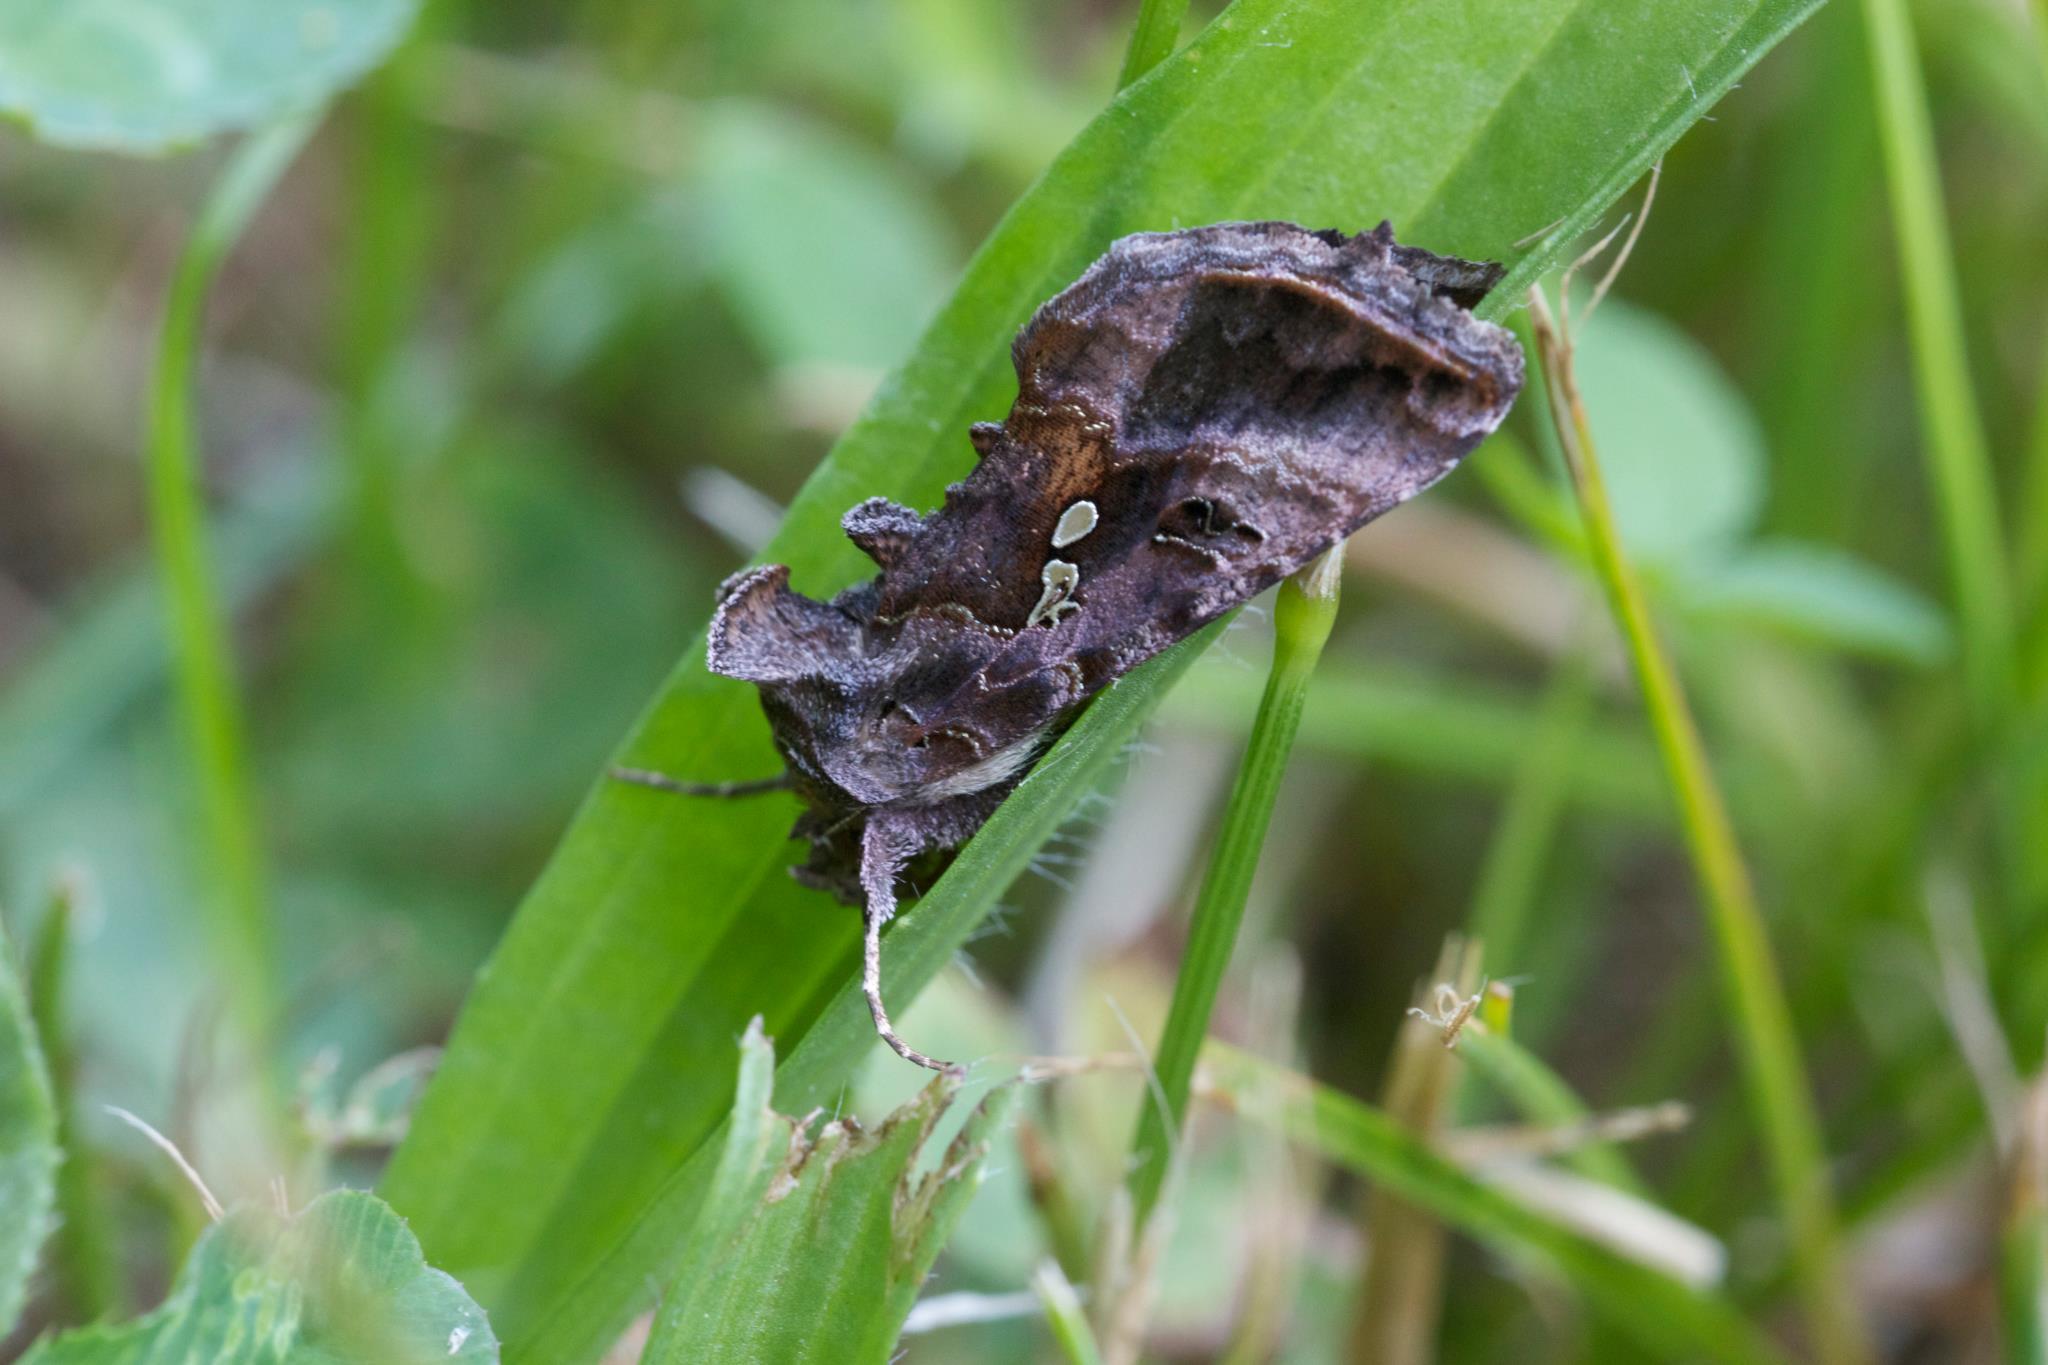 Soybean looper with iridescent wing patches  (c) Elena Tartaglia